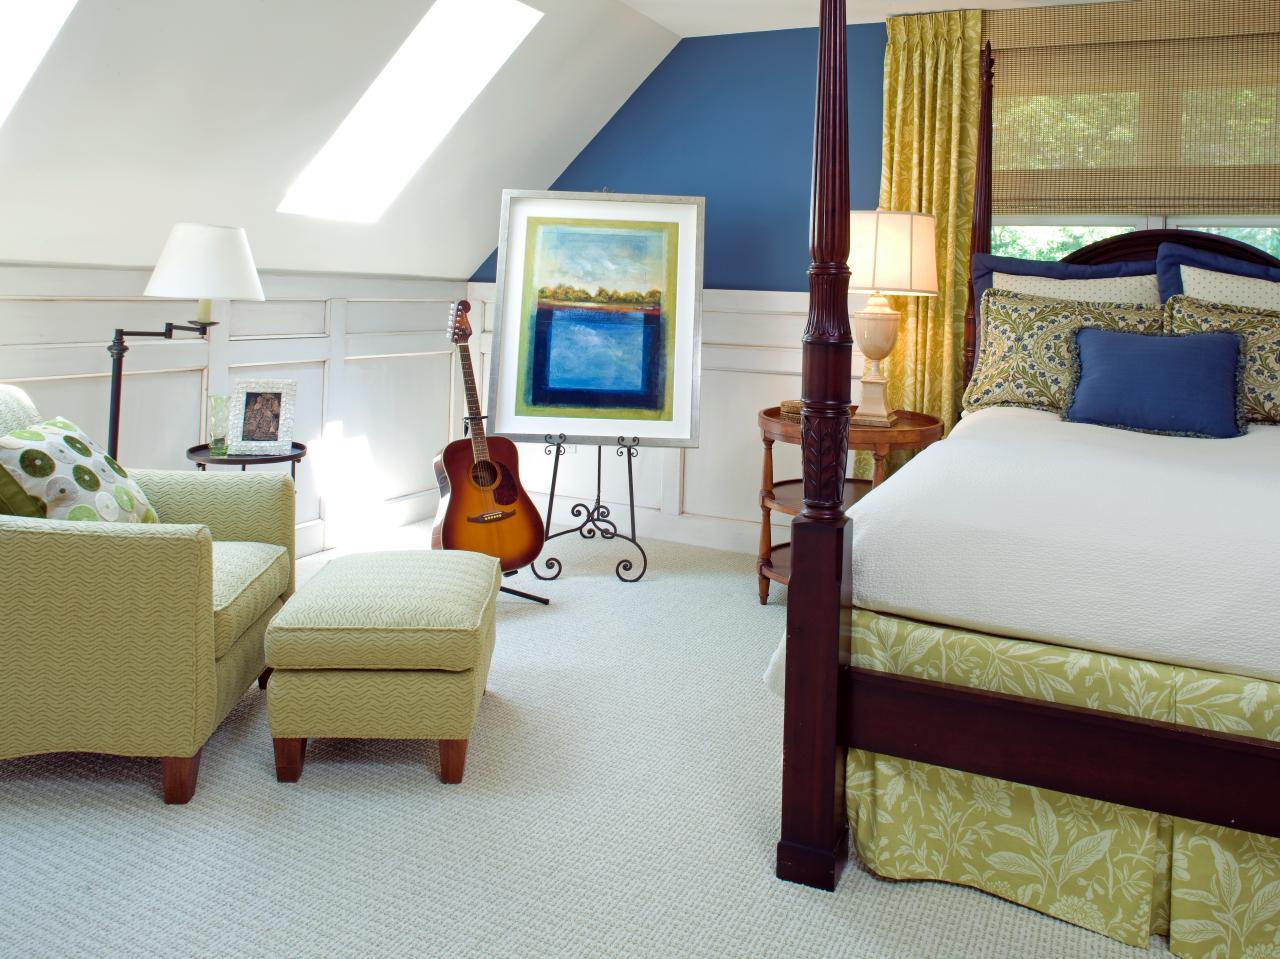 5 Expert Bedroom Storage Ideas